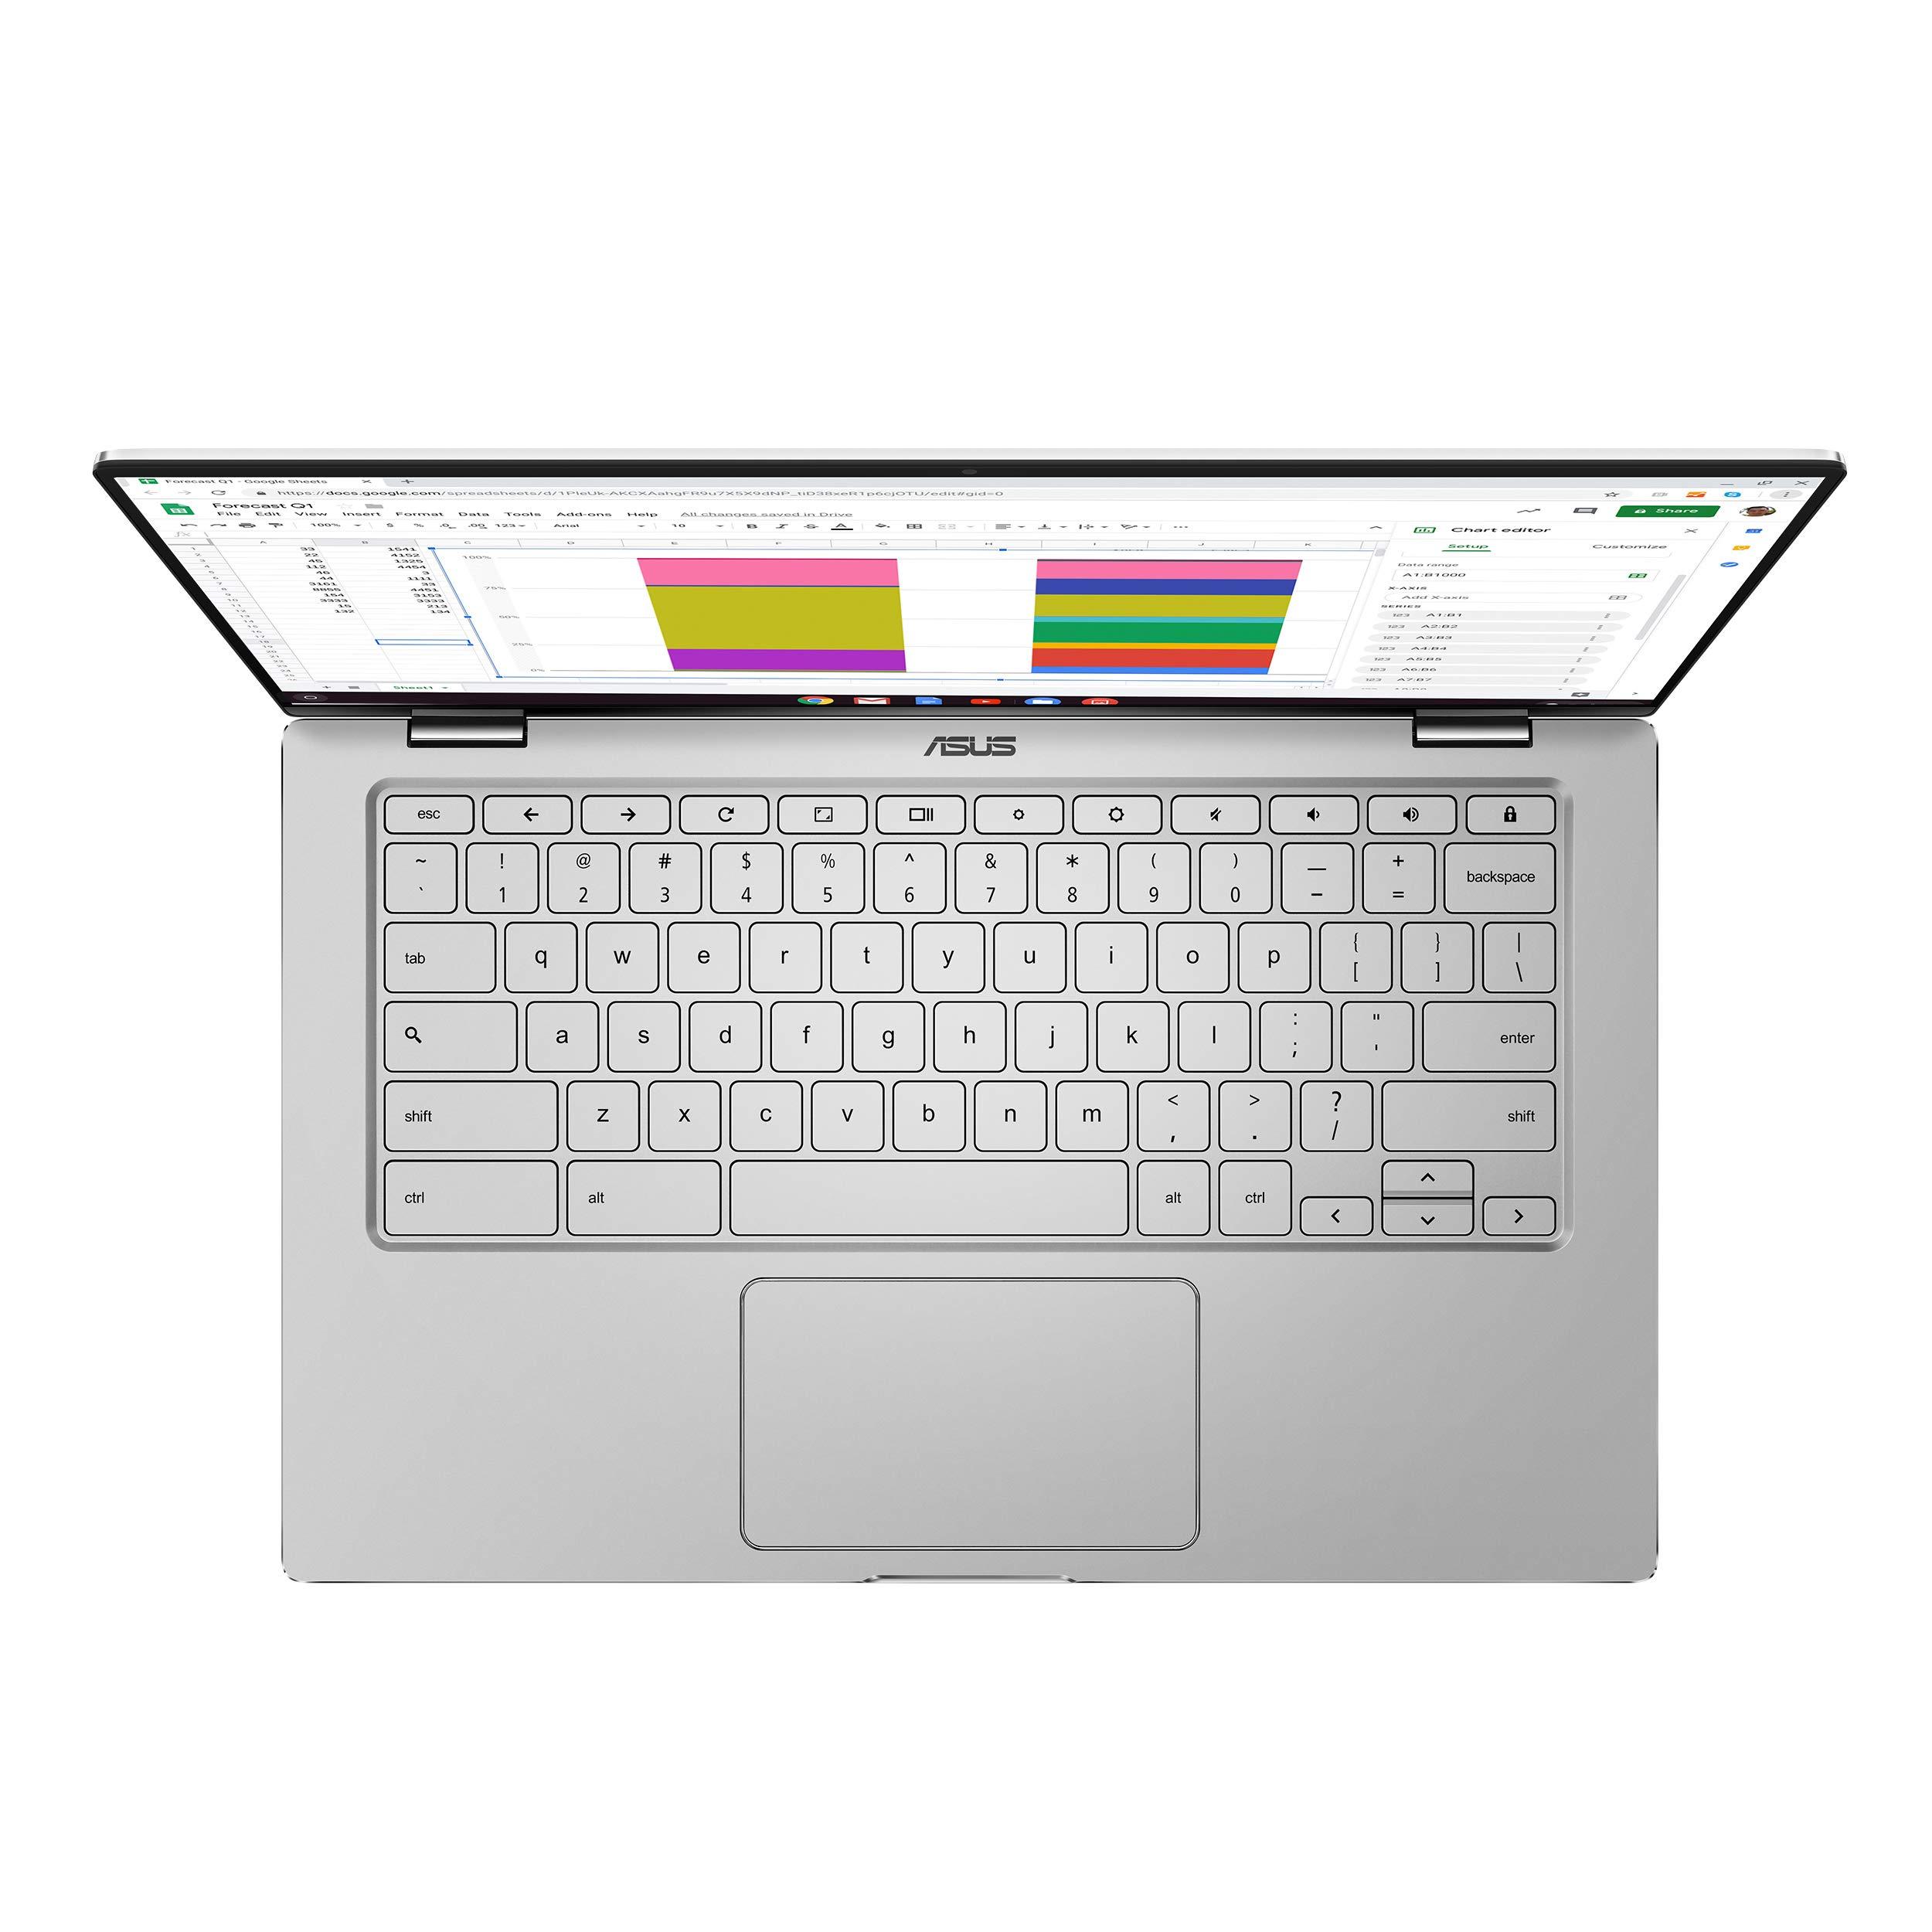 ASUS Chromebook Flip C434TA-DSM4T 2-in-1 Laptop 14'' Touchscreen Full HD 4-Way NanoEdge, Intel Core M3-8100Y Processor, 4GB RAM, 64GB eMMC Storage, Chrome OS by ASUS (Image #6)